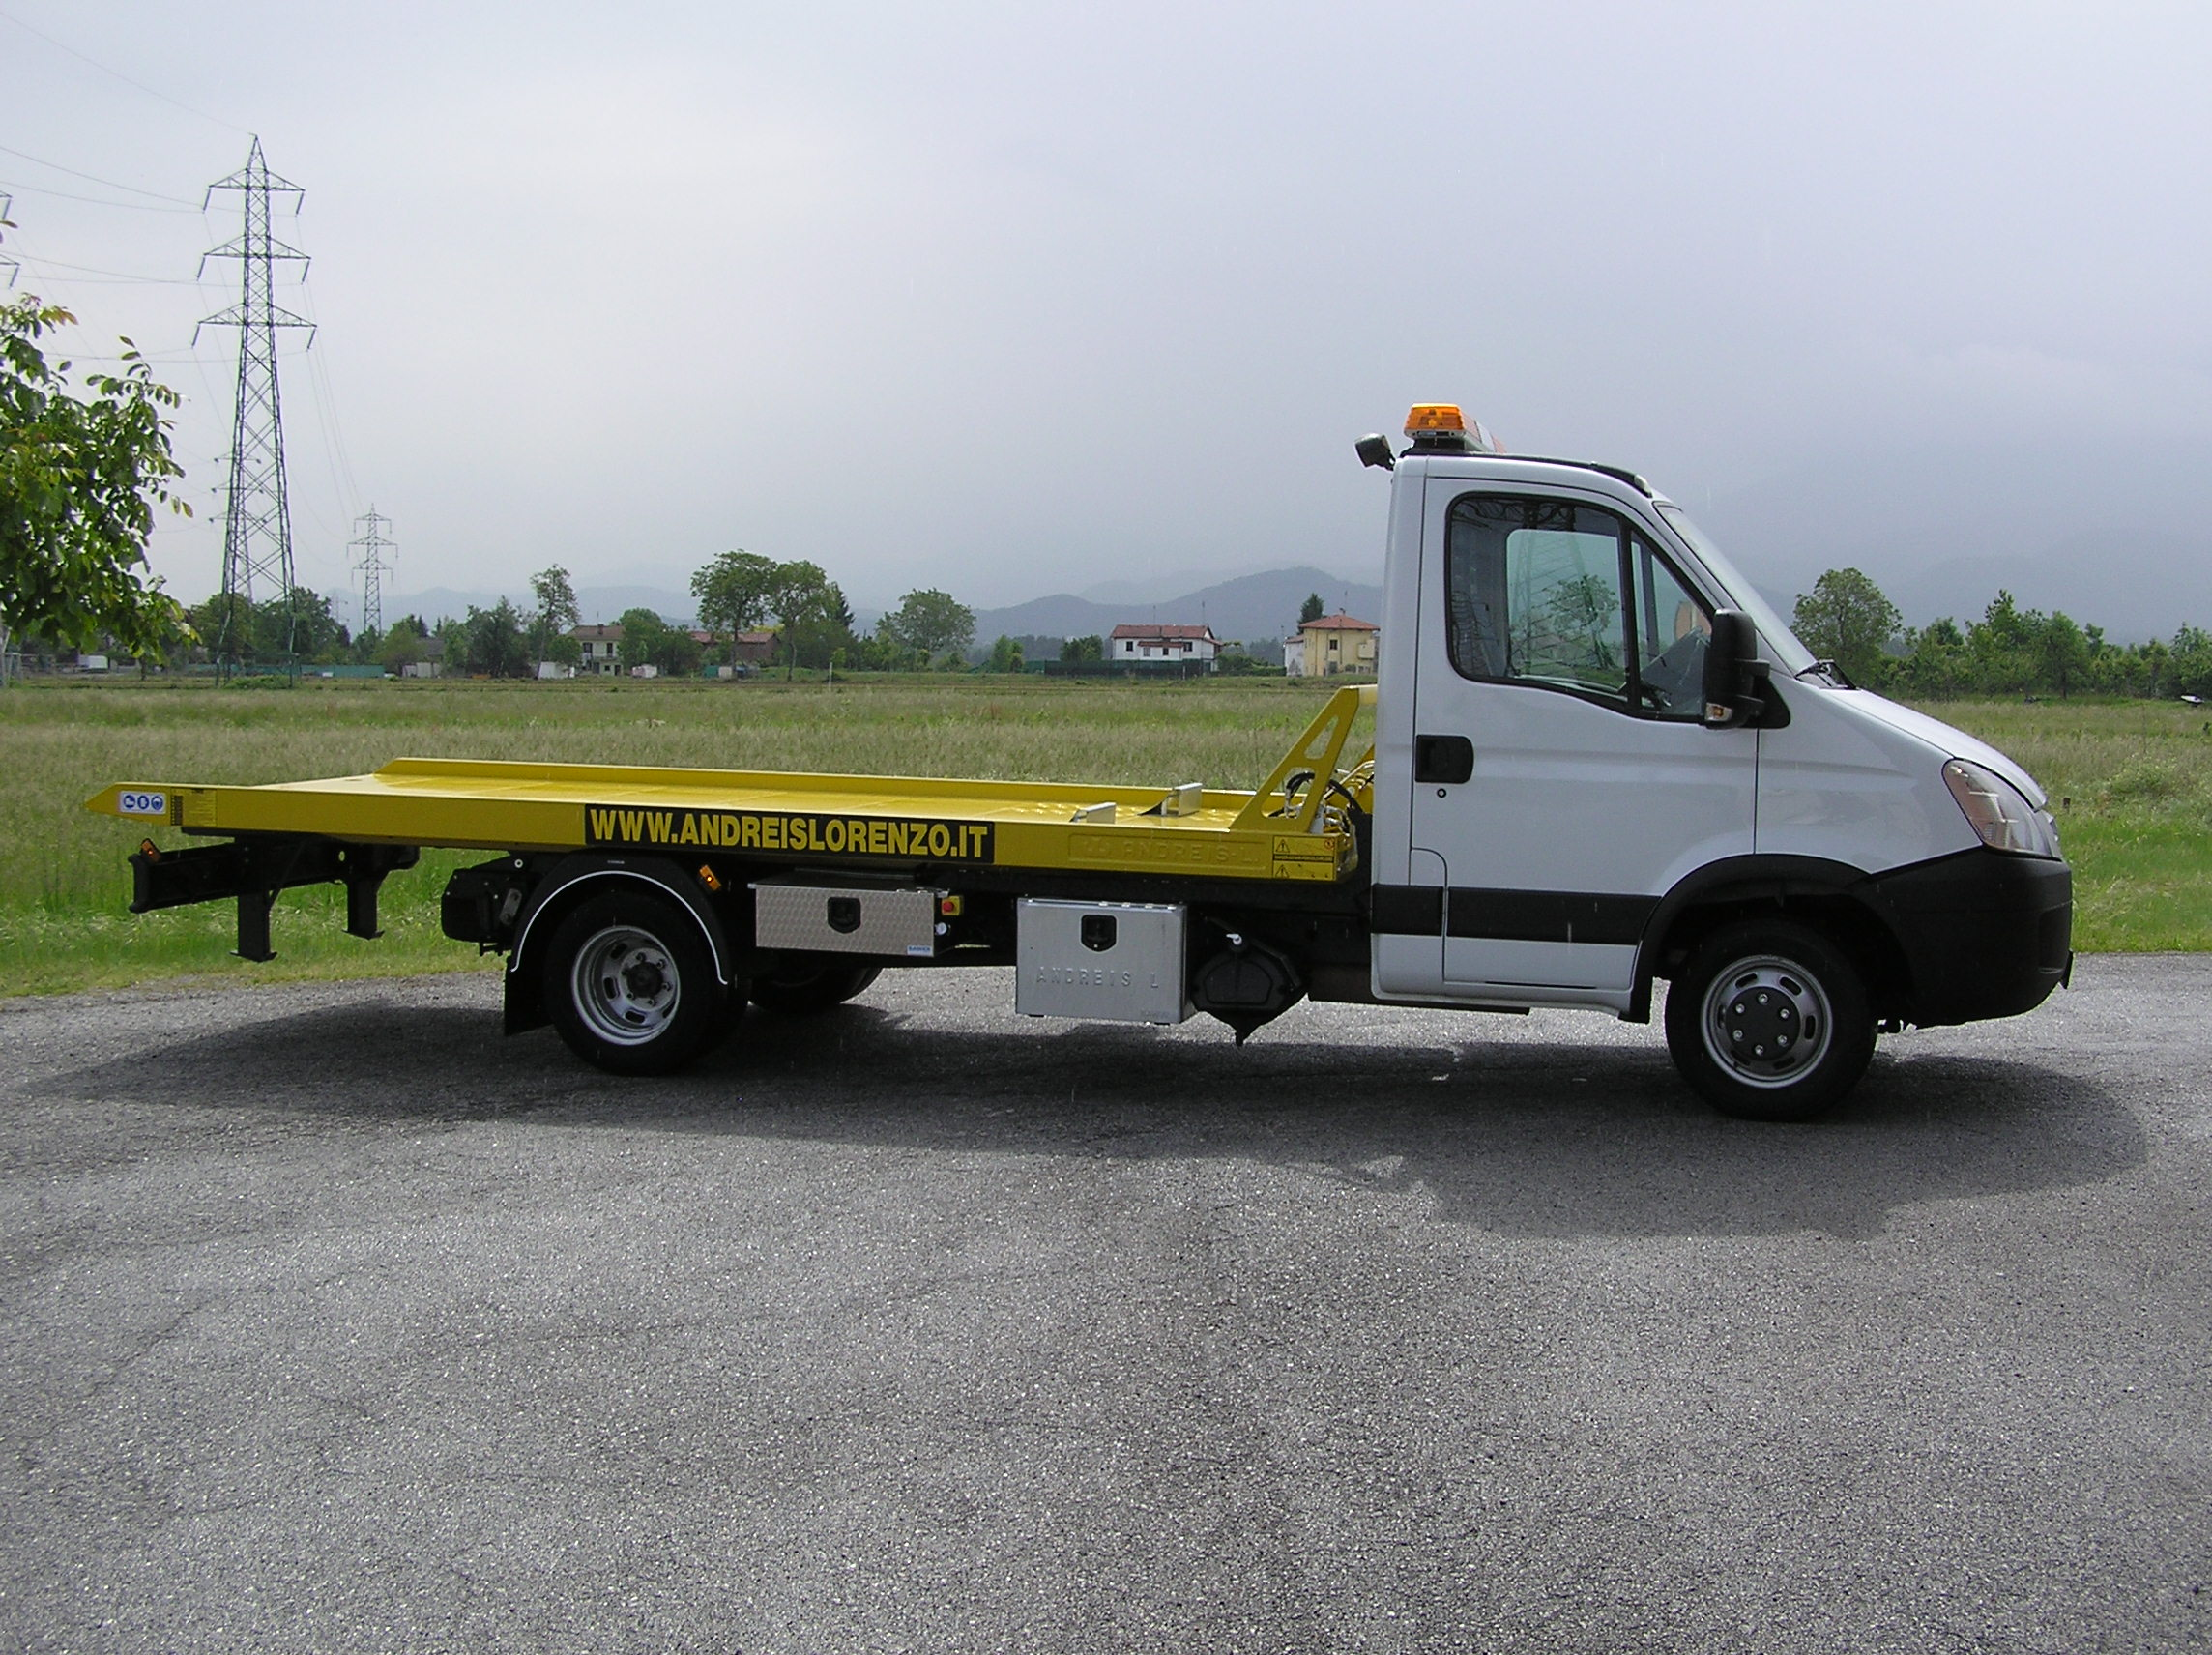 Nissan Work Van >> File:Dépanneuse carro attrezzi towing truck Abschleppwagen эвакуатор laweta DAILY.JPG ...